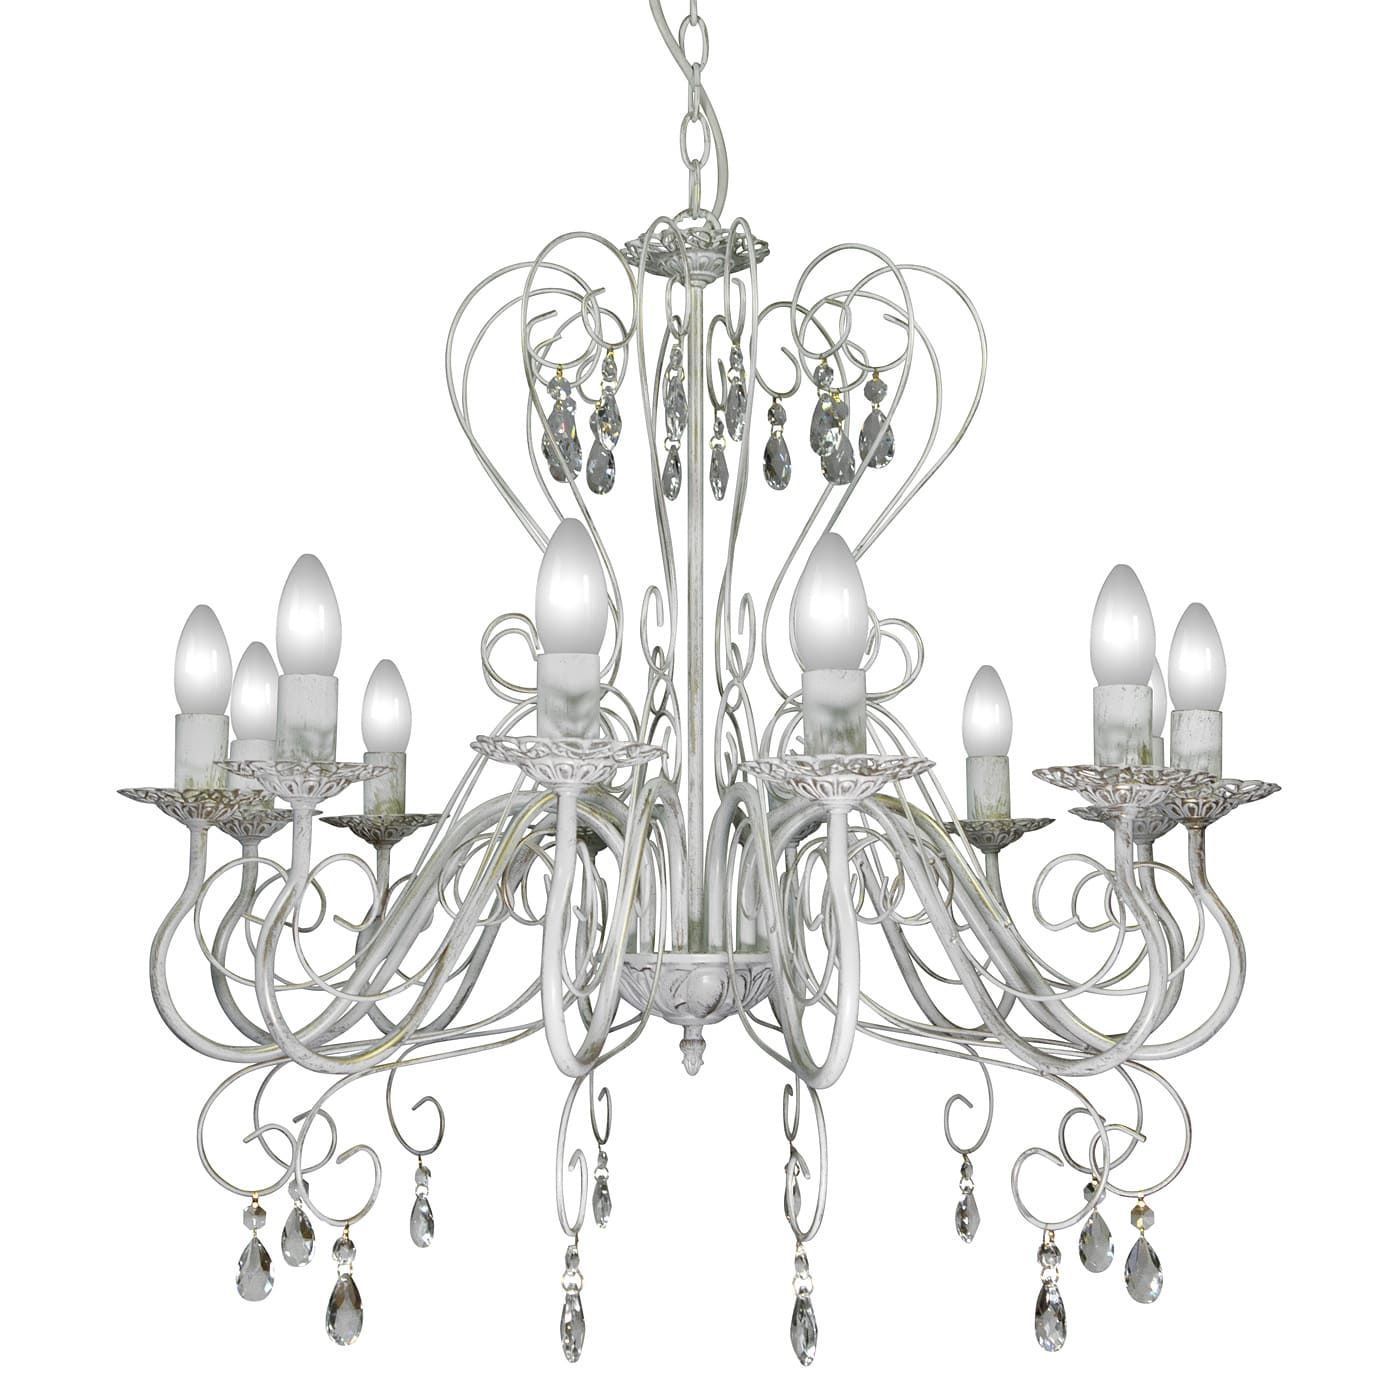 PETRASVET / Pendant chandelier S1021-12, 12xE14 max. 60W